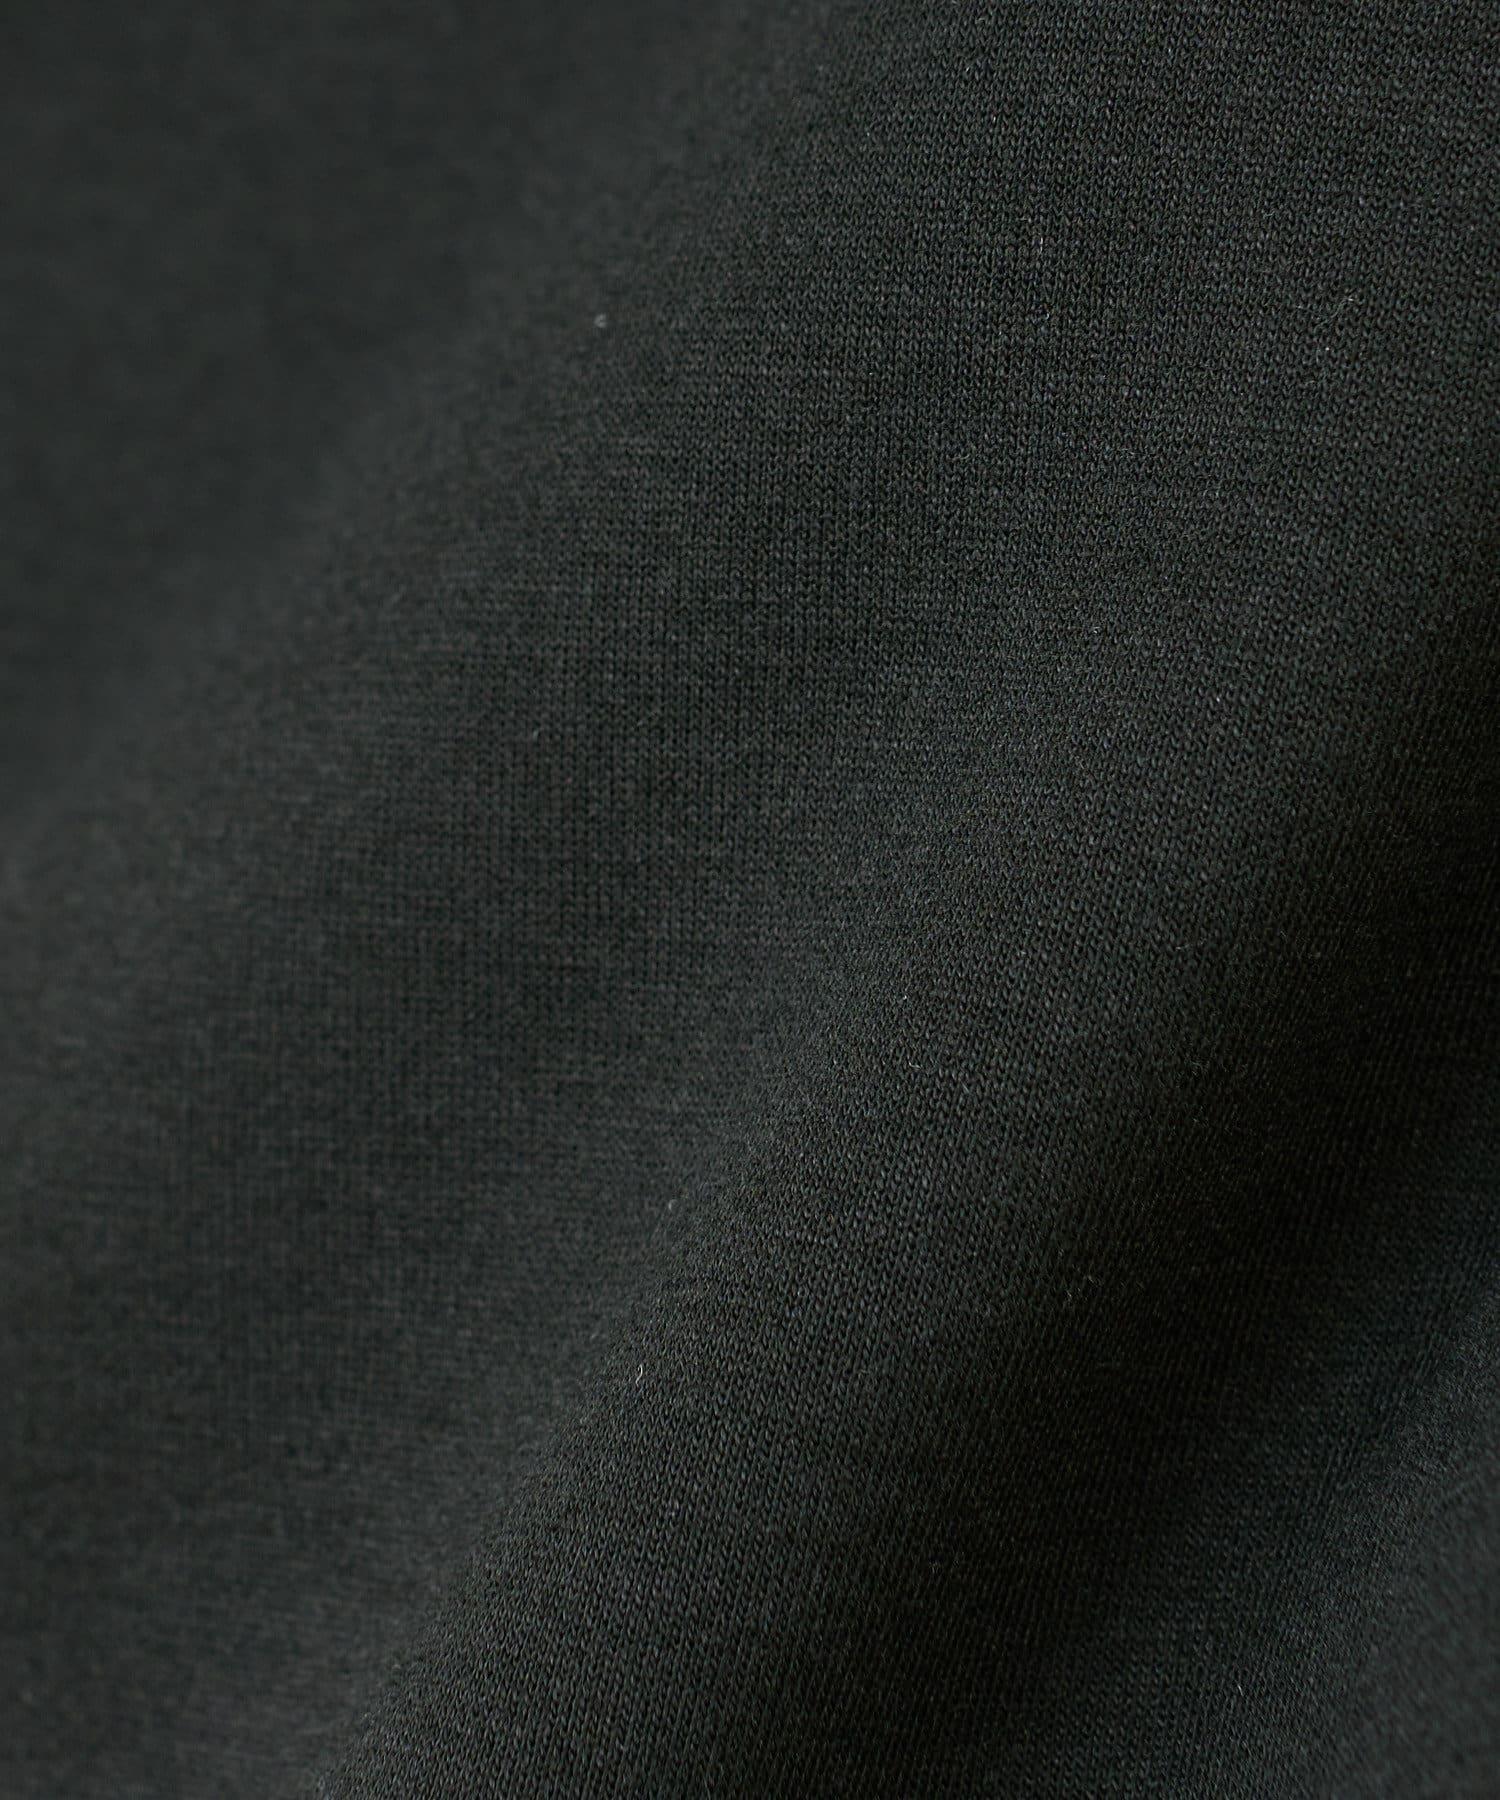 COLLAGE GALLARDAGALANTE(コラージュ ガリャルダガランテ) 【オンラインストア限定】スウェットフーディー